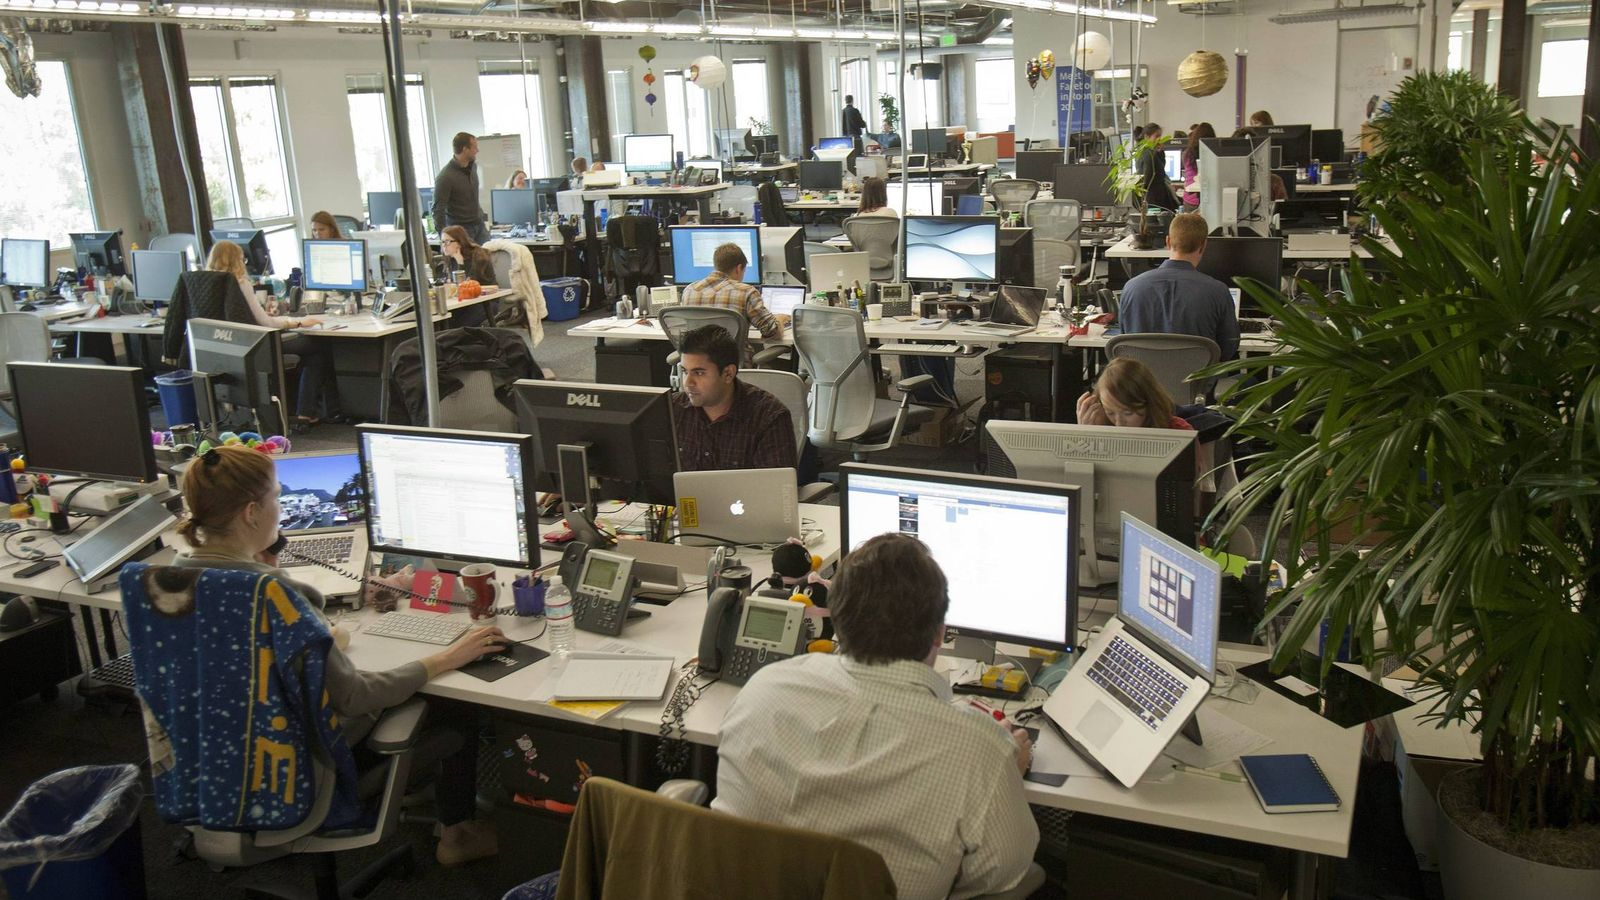 tablet la mesa de trabajo ha muerto larga vida a la oficina del futuro blogs de tribuna